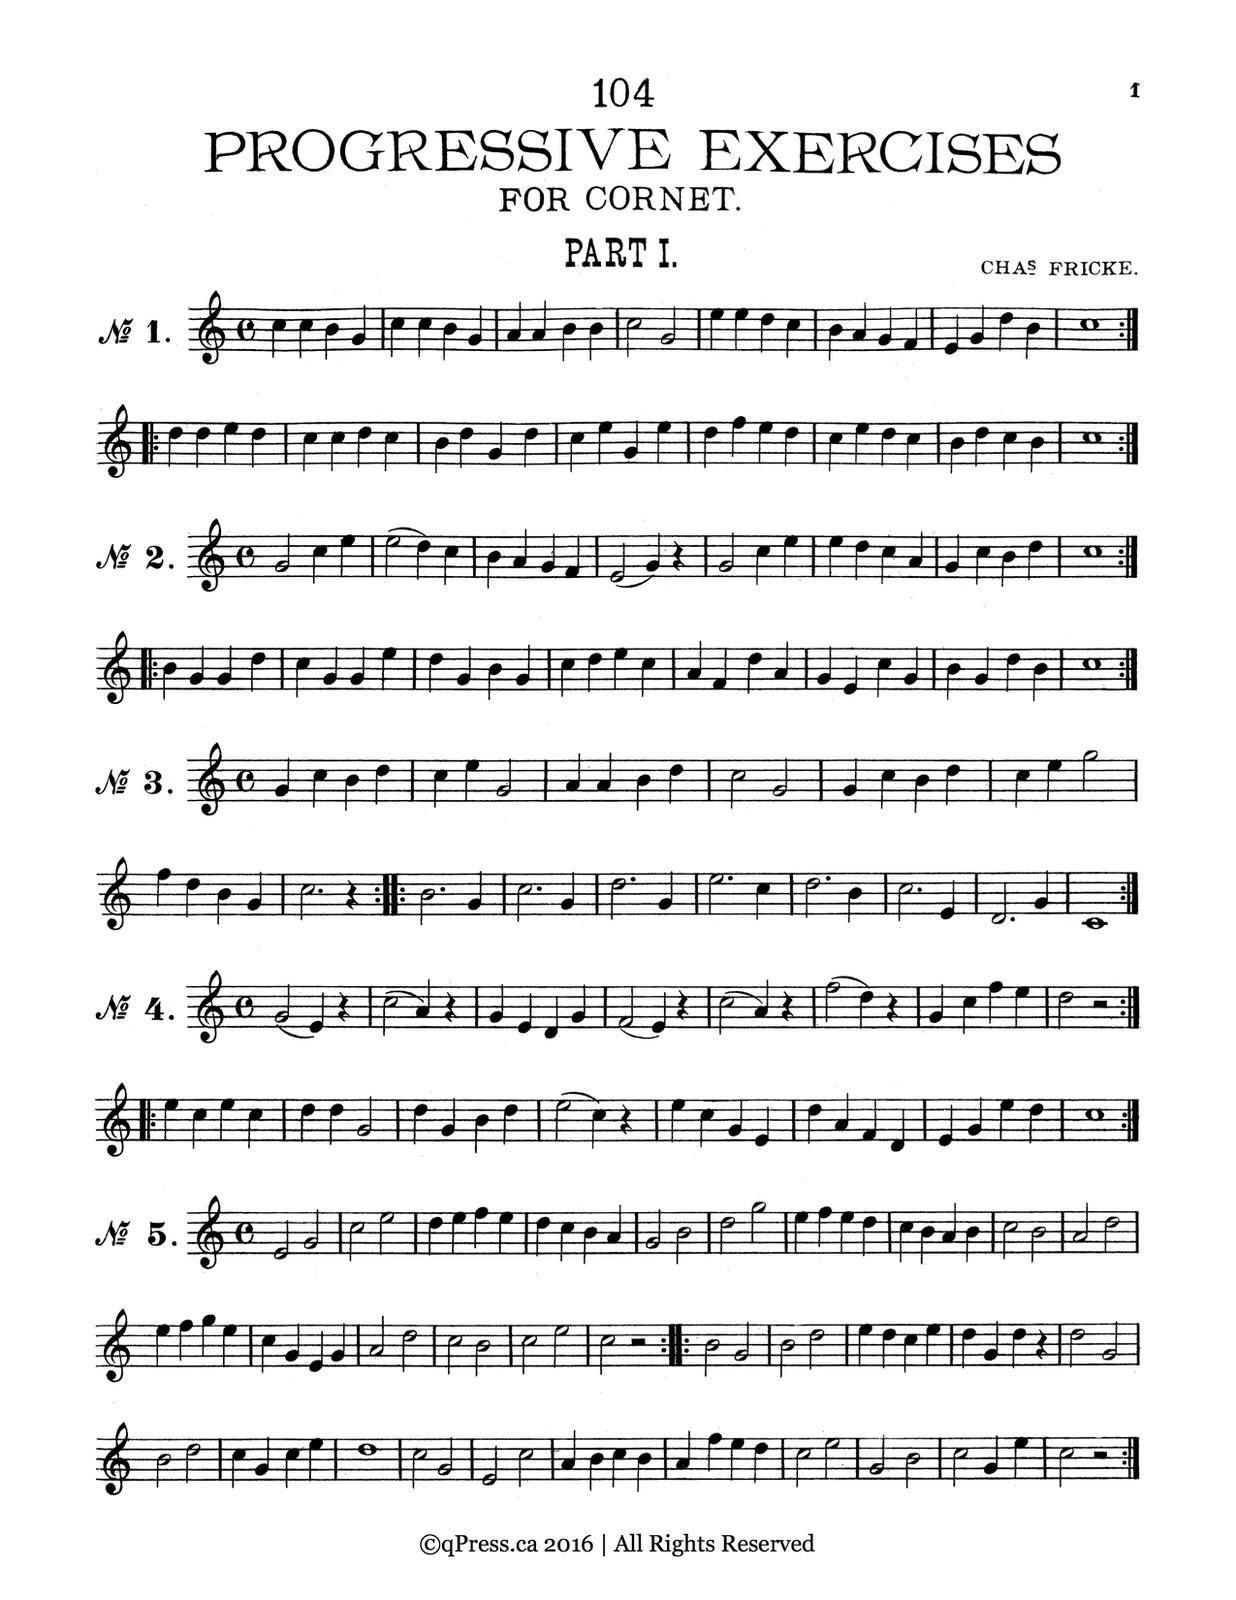 fricke-charles-104-progressive-exercises-for-wind-instruments-2